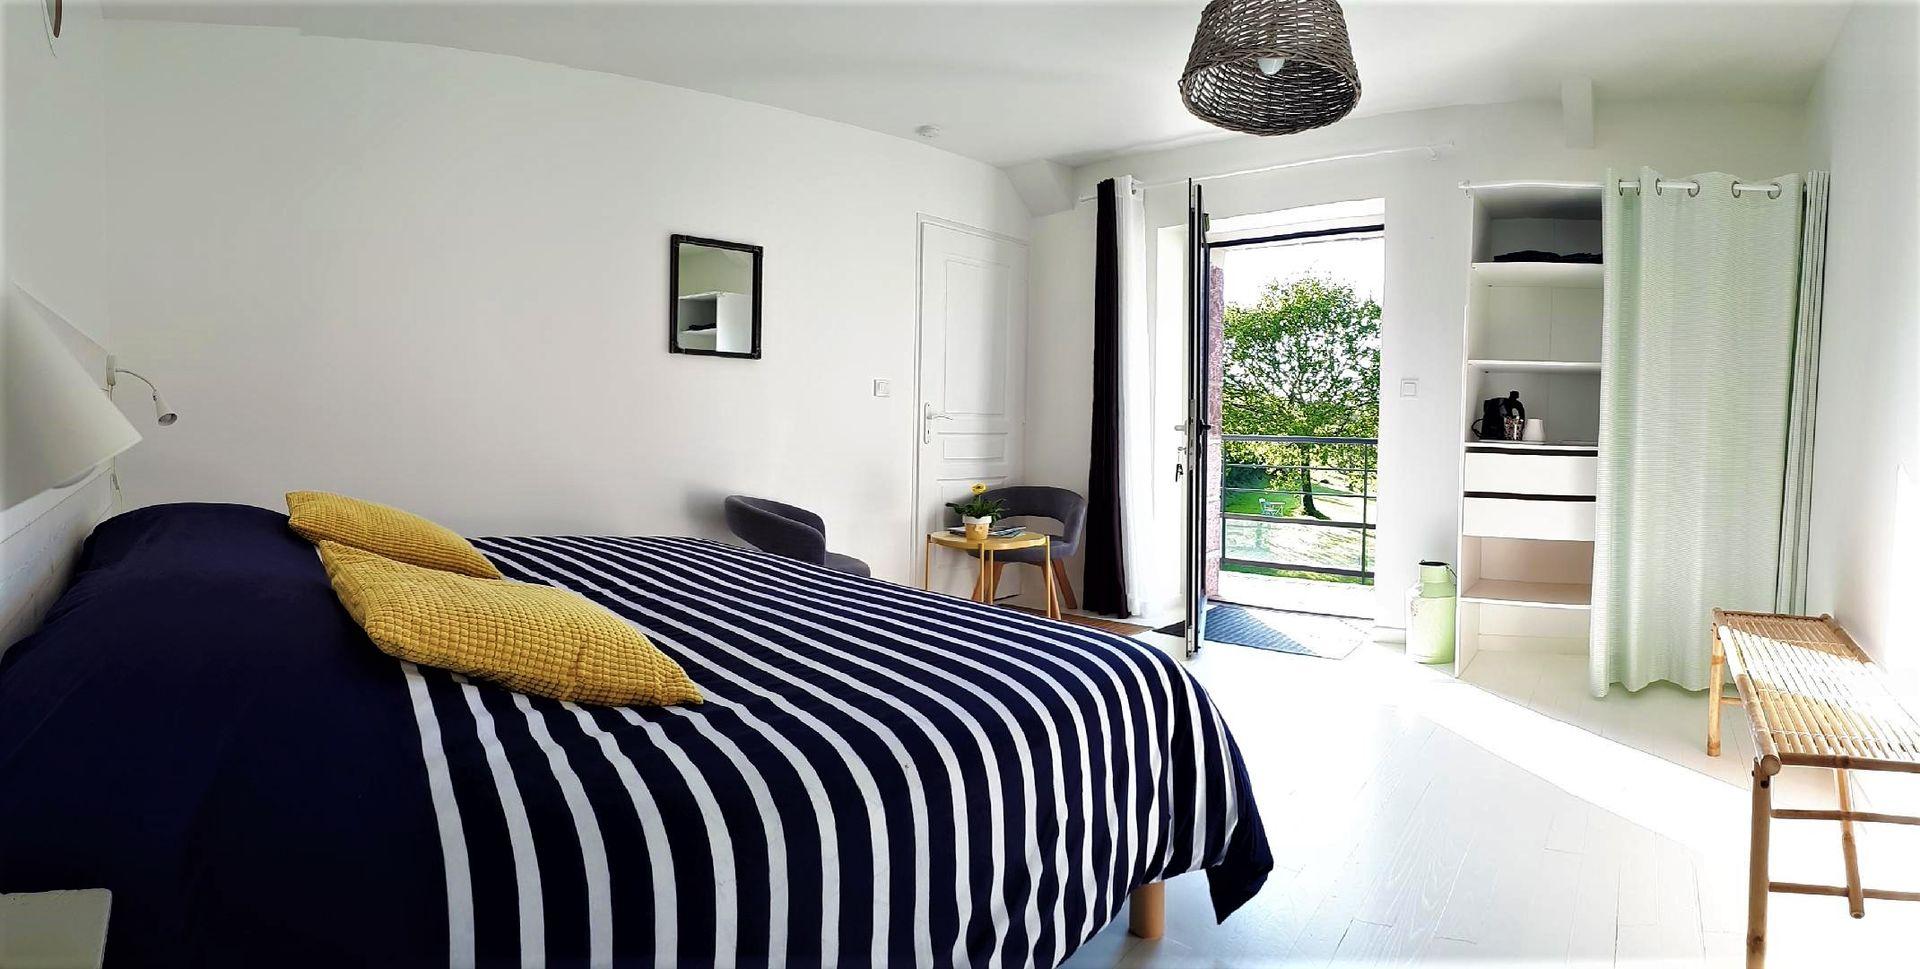 Chambres---La--Fontaine-de-Resnel---chambre-2---Frehel---2018